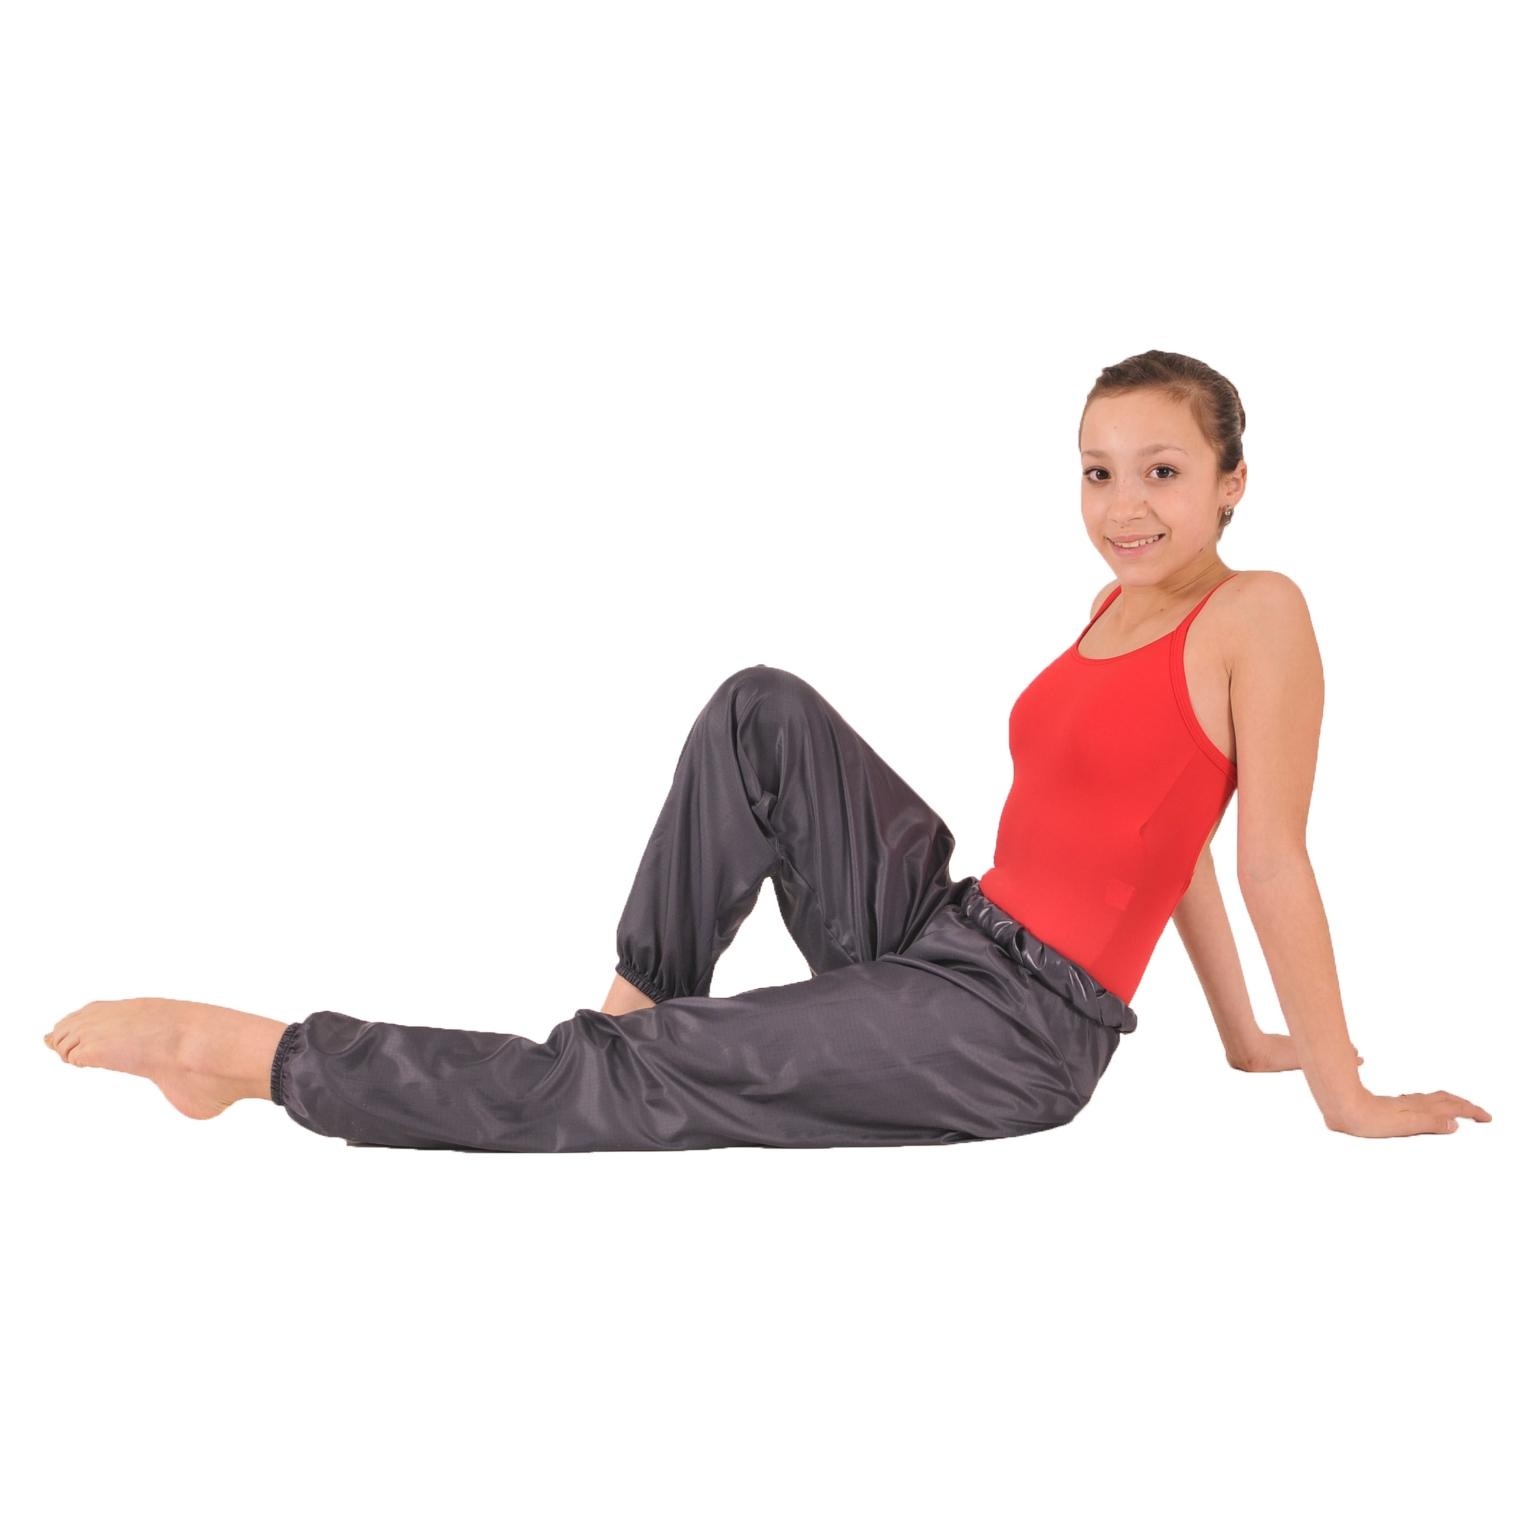 Pantalon de sudation INTERMEZZO ADEL 5000, pour danseuses.